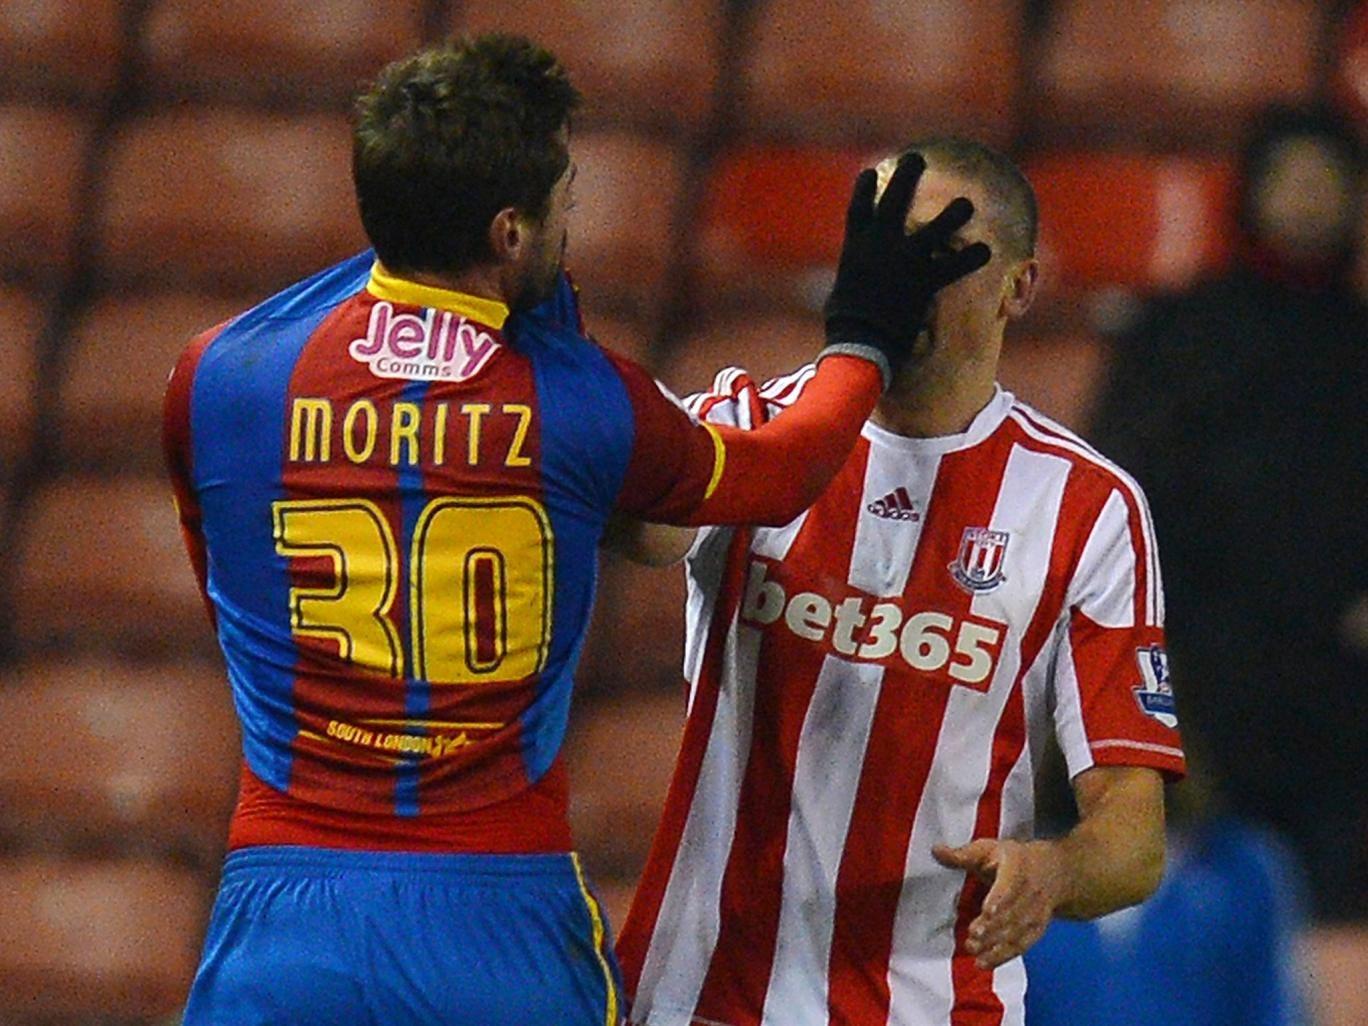 Crystal Palace's midfielder Andre Moritz confronts Stoke City forward Jon Walters